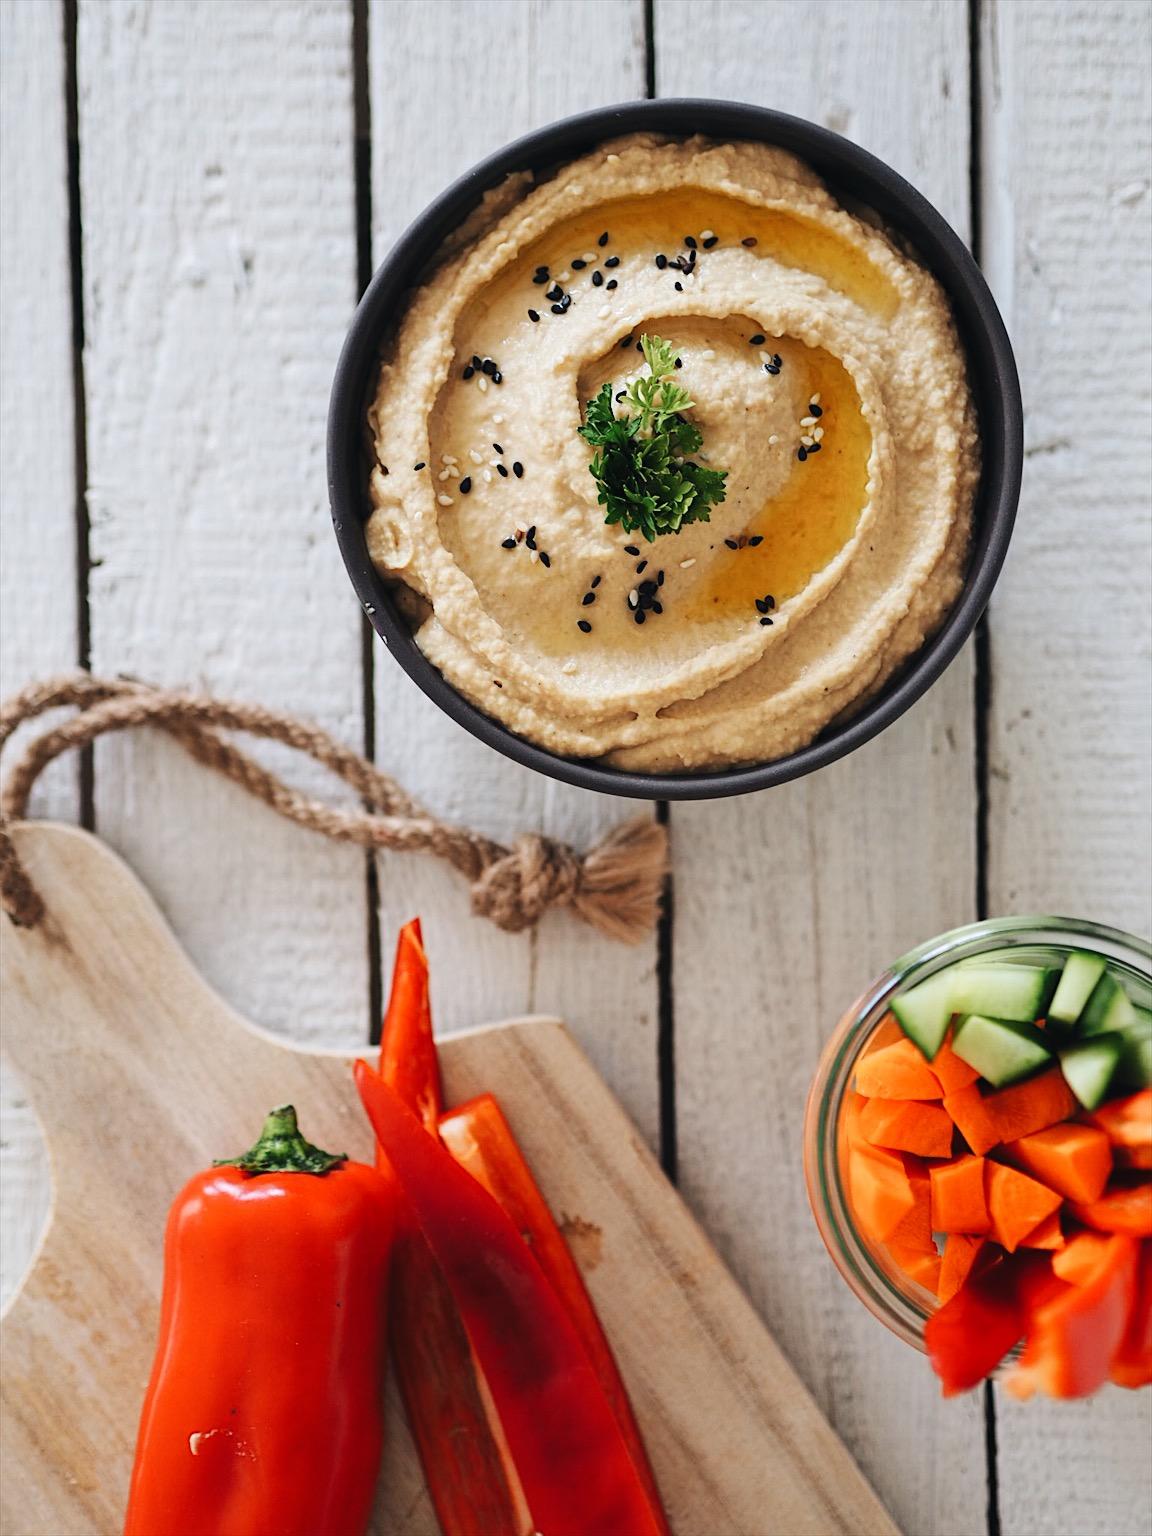 coucoubonheur_foodbblog_muenchen_nuernberg_hummus_dip_rezept